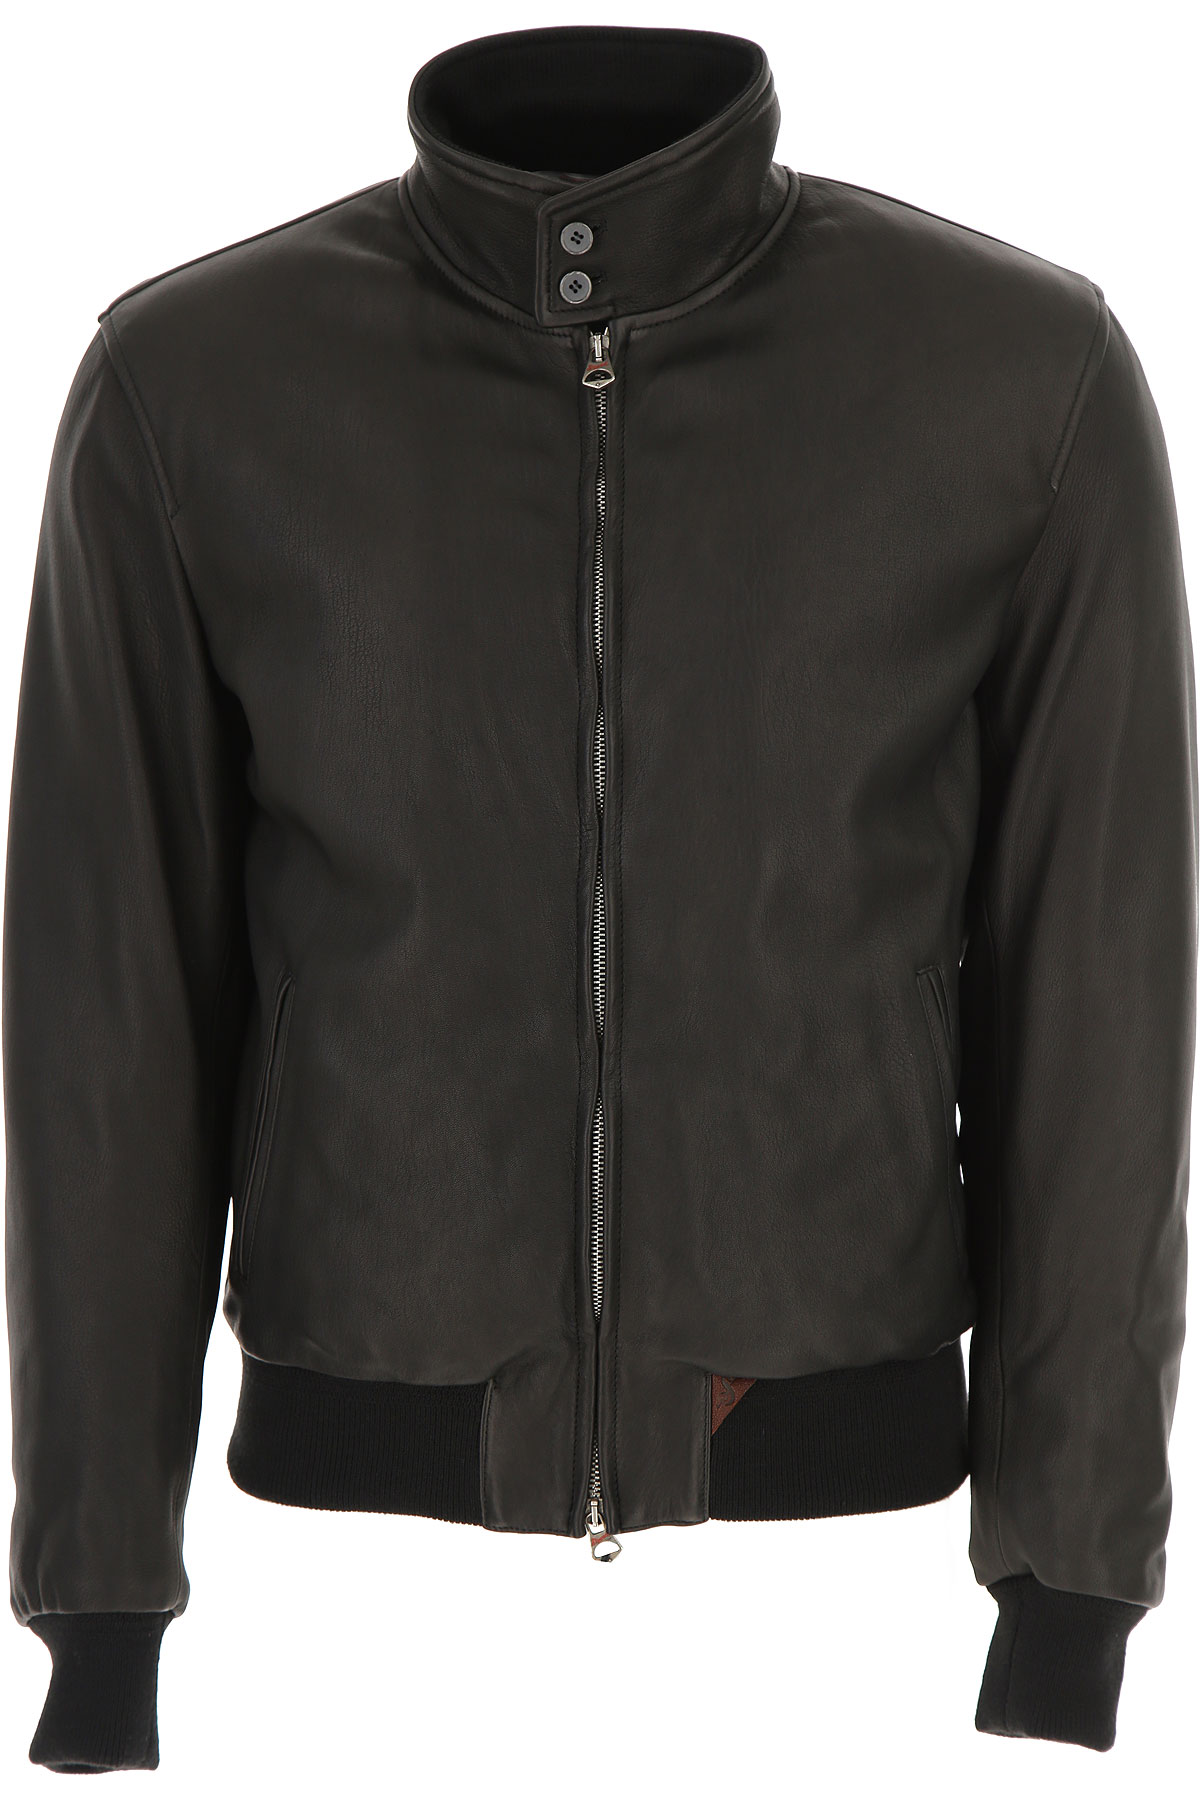 Image of Stewart Leather Jacket for Men, Black, Lamb Leather, 2017, XL XXL